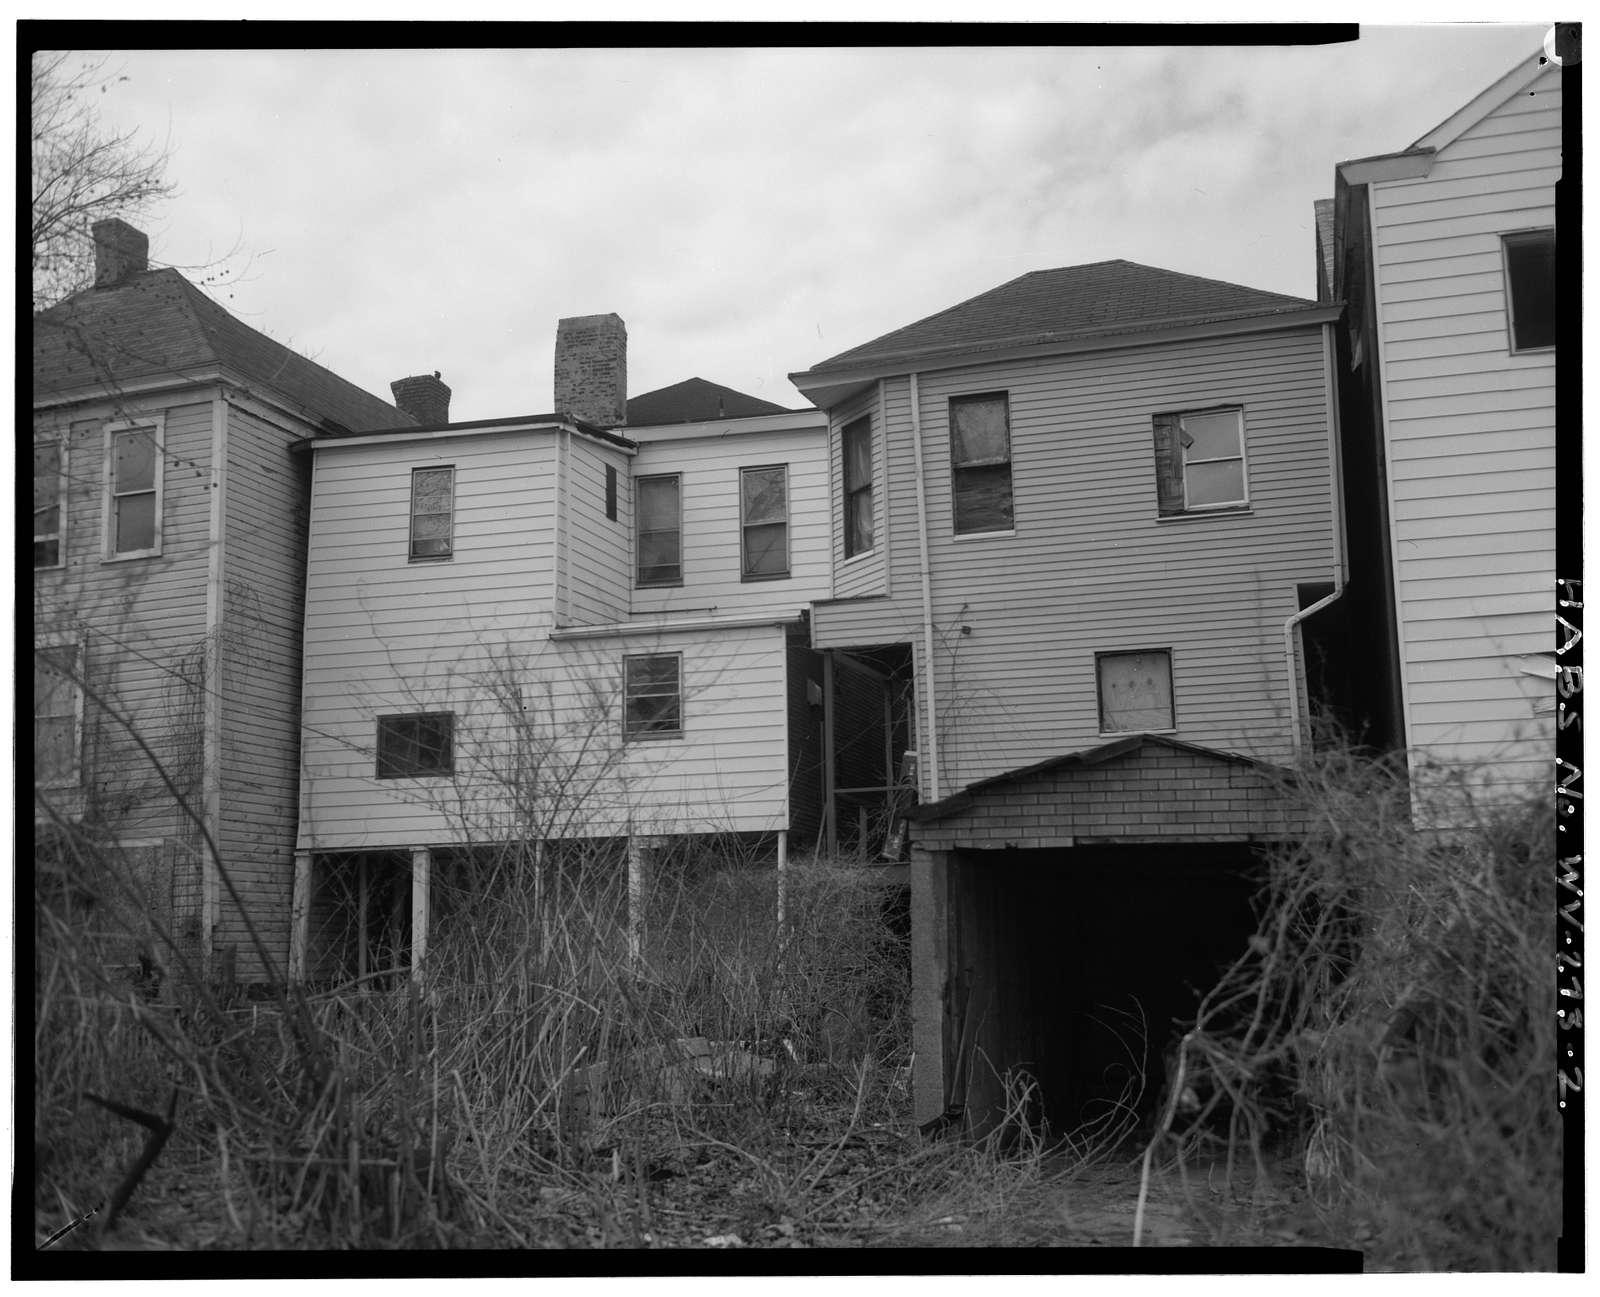 178 Zane Street (House), Wheeling, Ohio County, WV